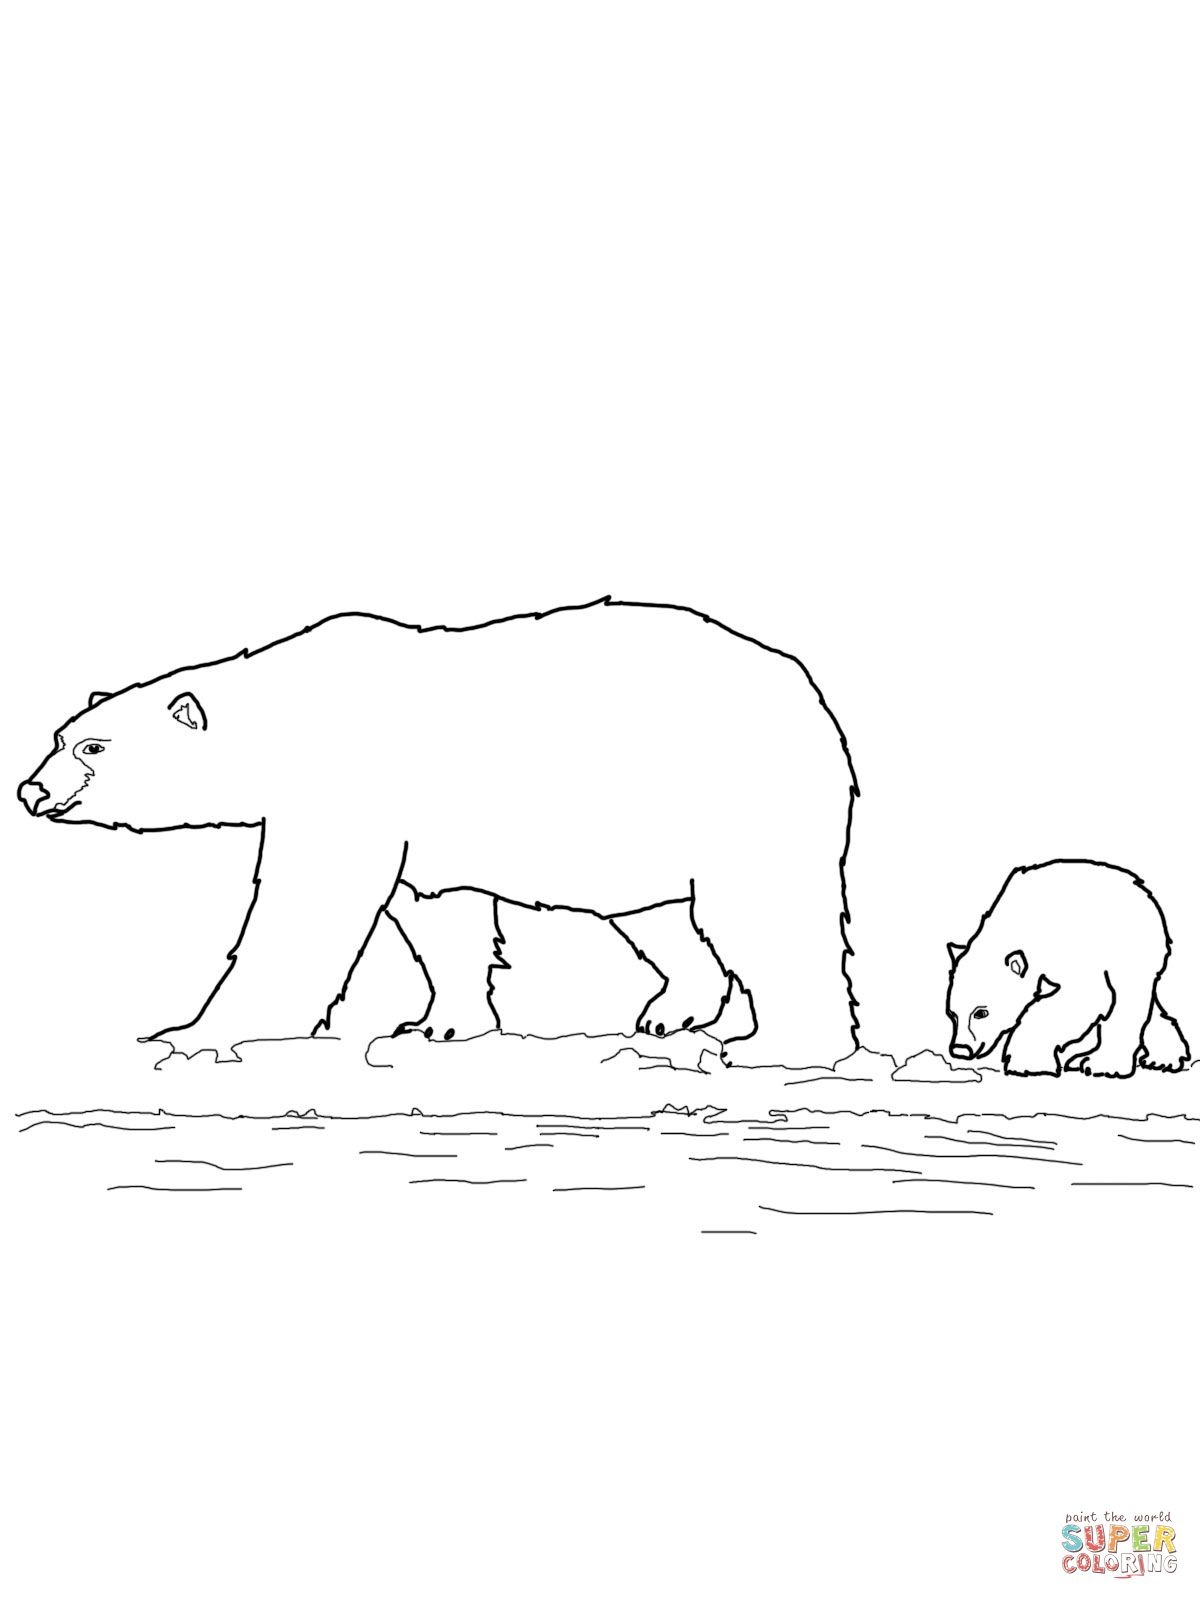 Polar Bears Family Coloring Page | Supercoloring | Handy Ideas - Polar Bear Printable Pictures Free